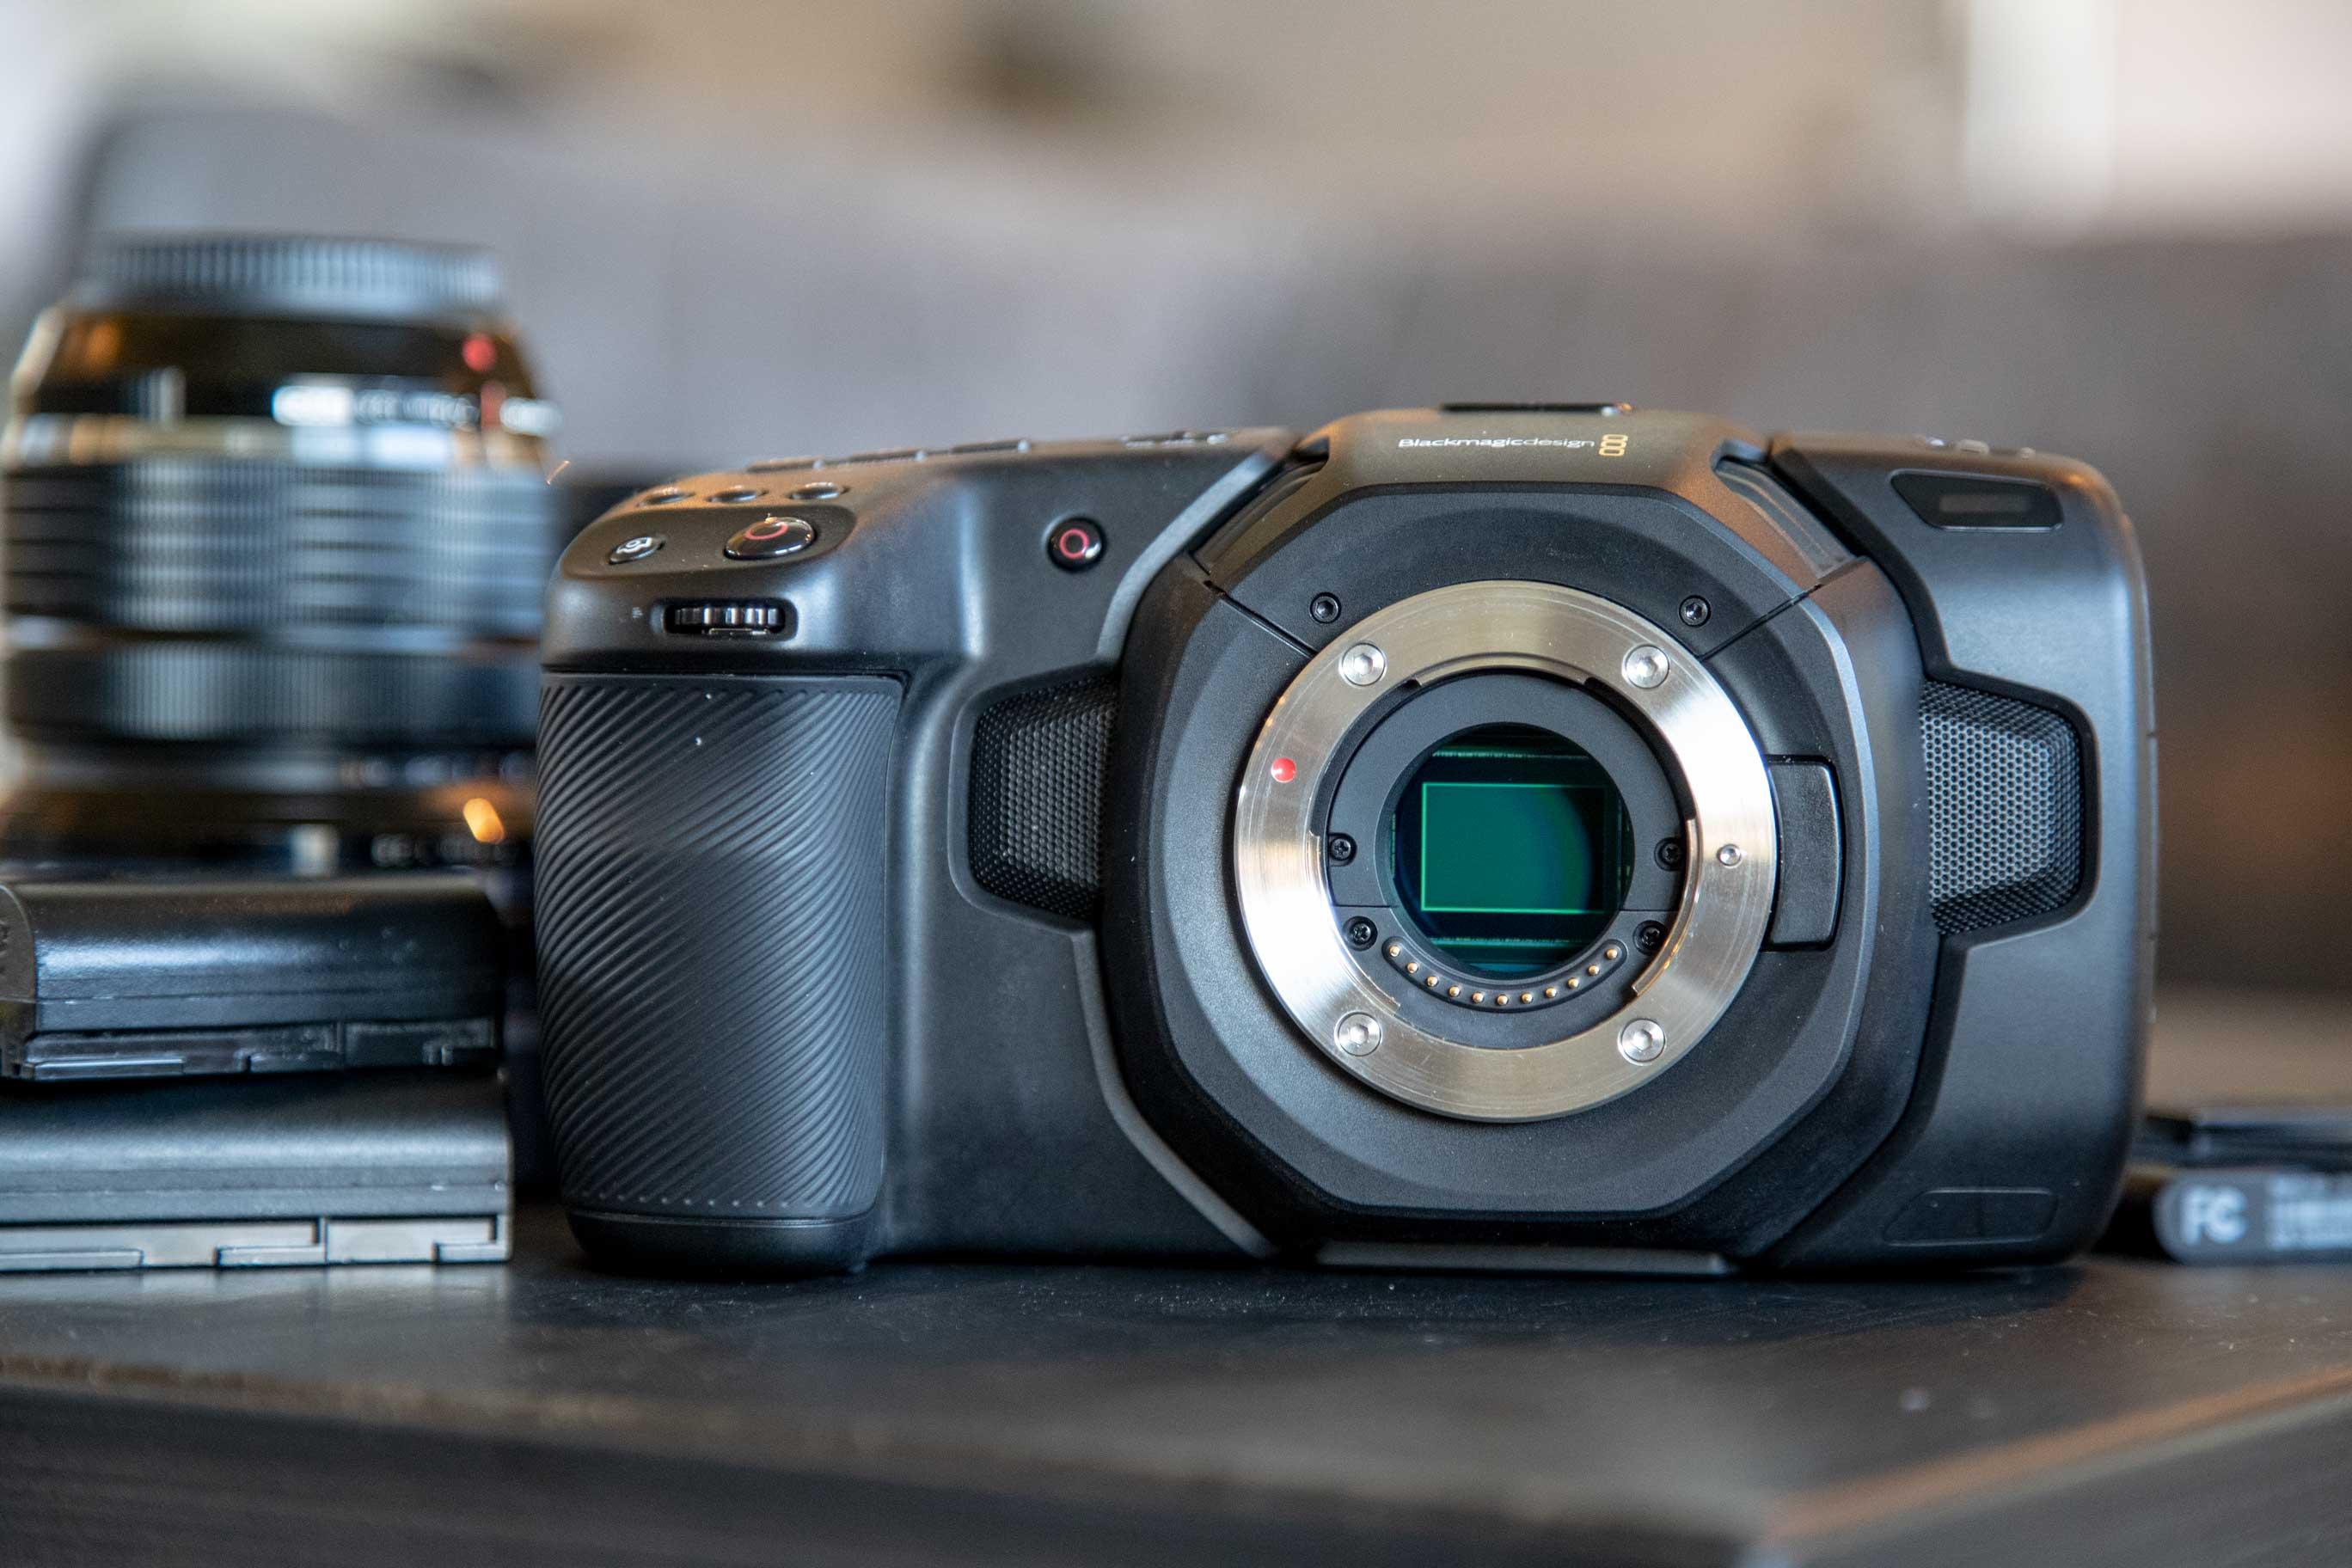 Blackmagic Design Pocket Cinema Camera 4k Review Value Flaws And 4k Raw Videomaker